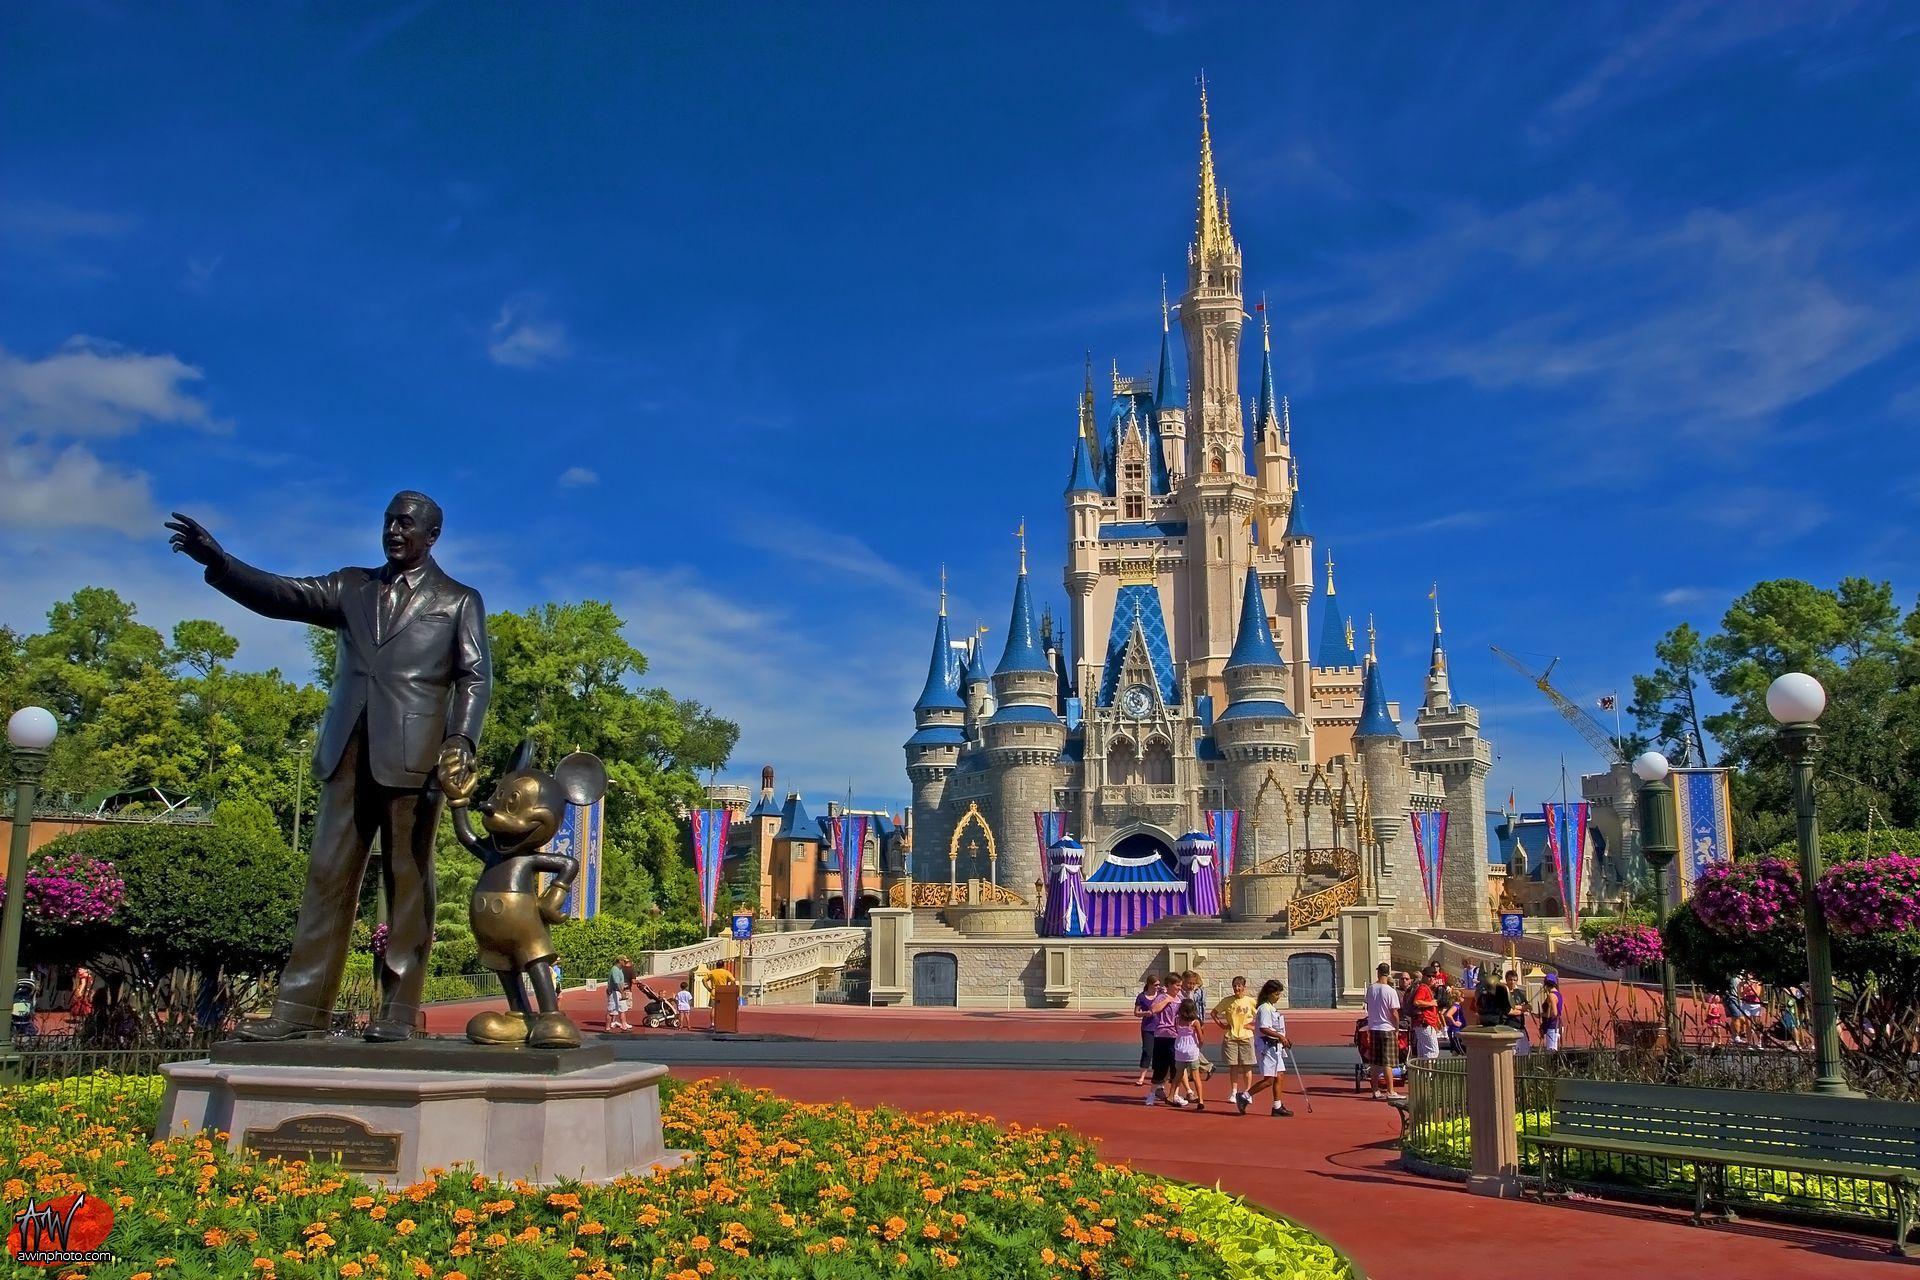 Disney World wallpaper design ideas